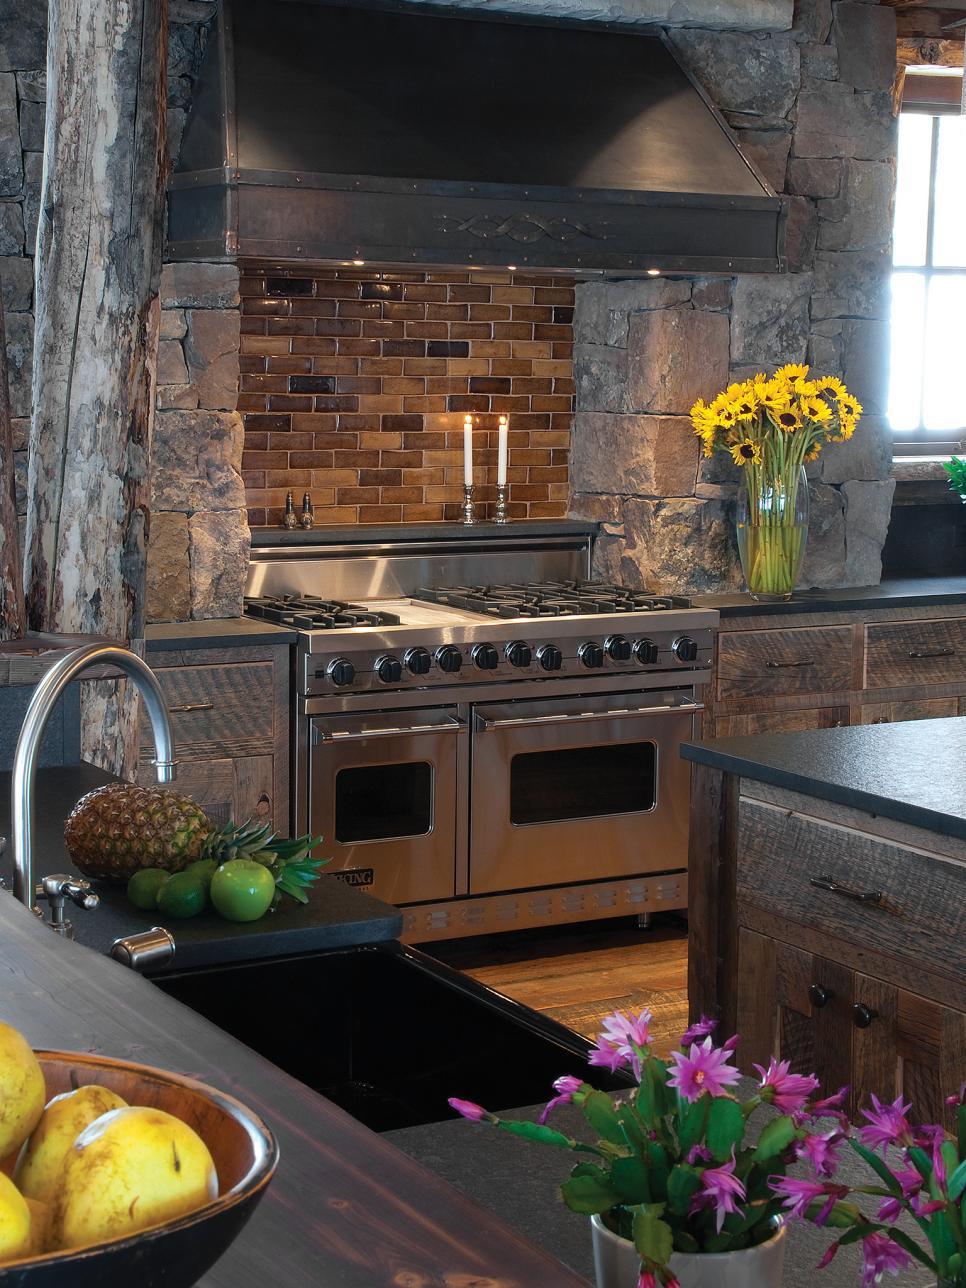 Editor 39 s pick 15 cozy cabin designs hgtv for Rustic kitchen backsplash tile